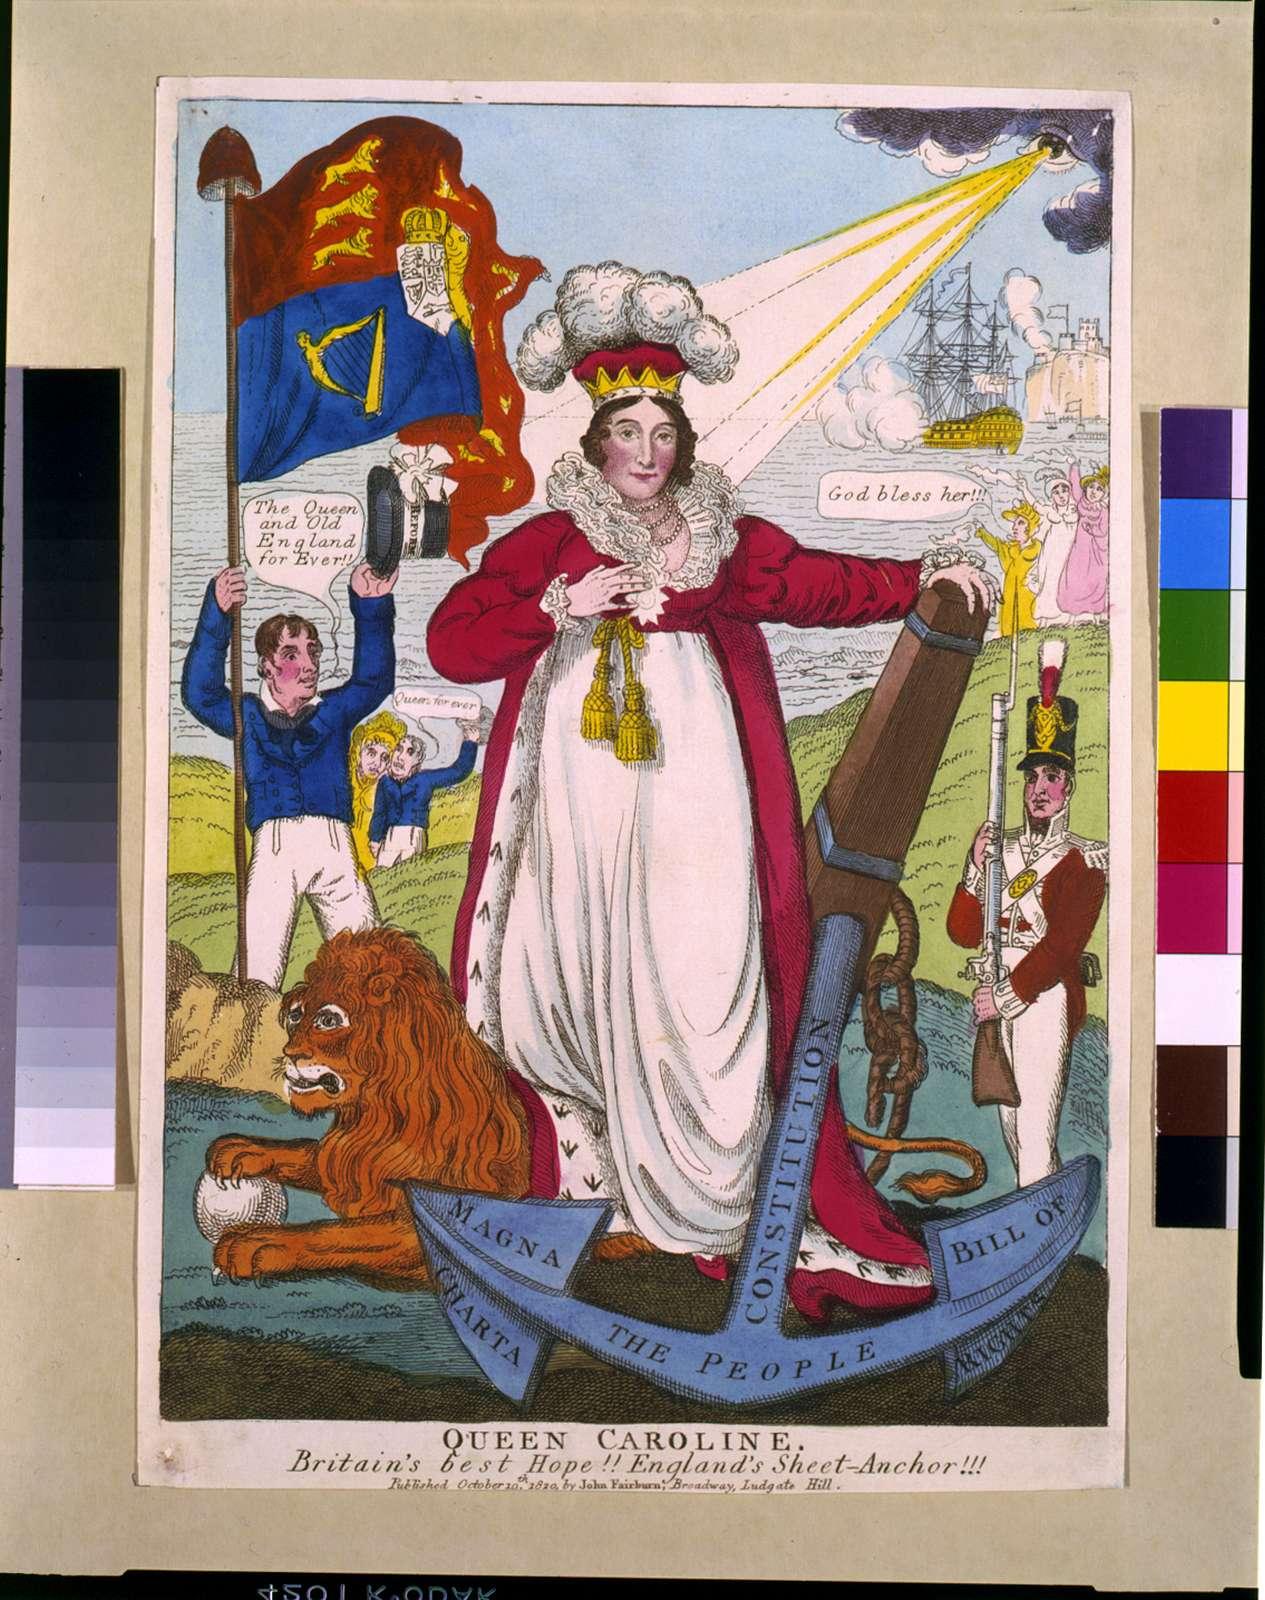 Queen Caroline. Britain's best hope!! England's sheet-anchor!!!